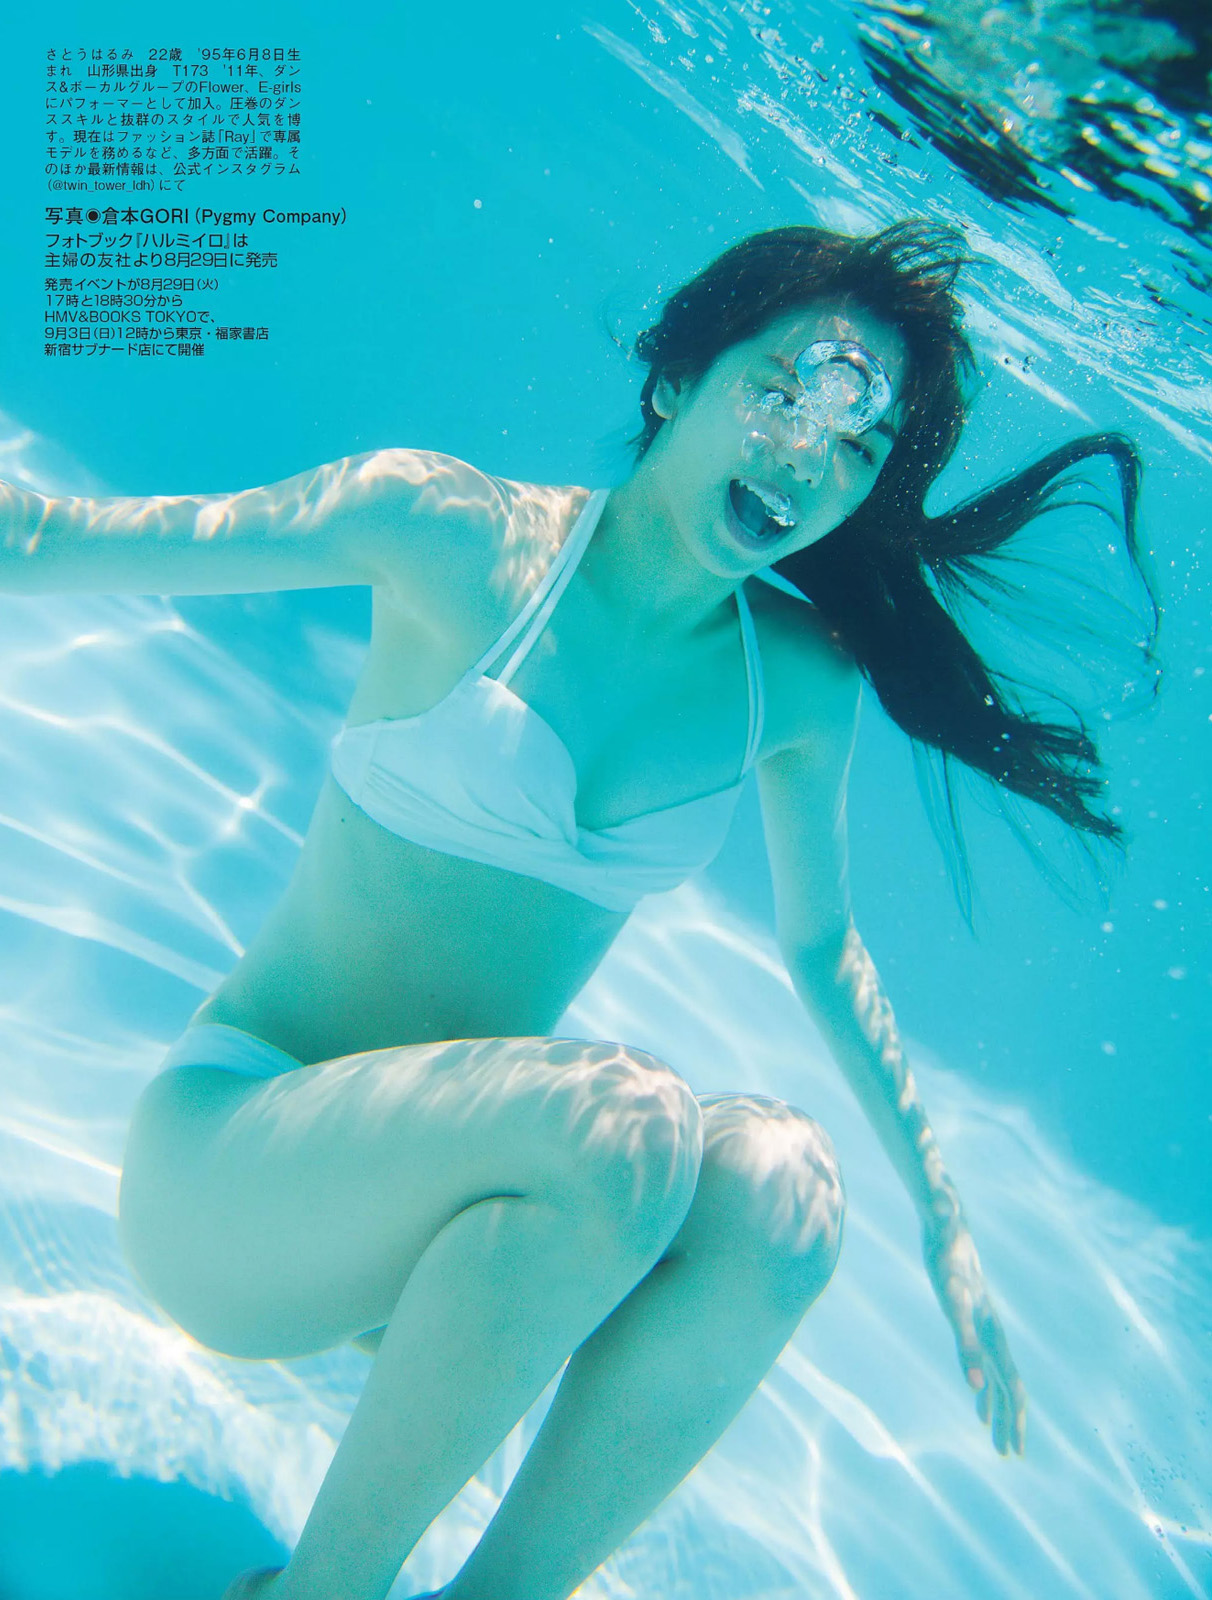 Sato Harumi 佐藤晴美, FLASH 電子版 2017.09.05 (フラッシュ 2017年09月05日号)